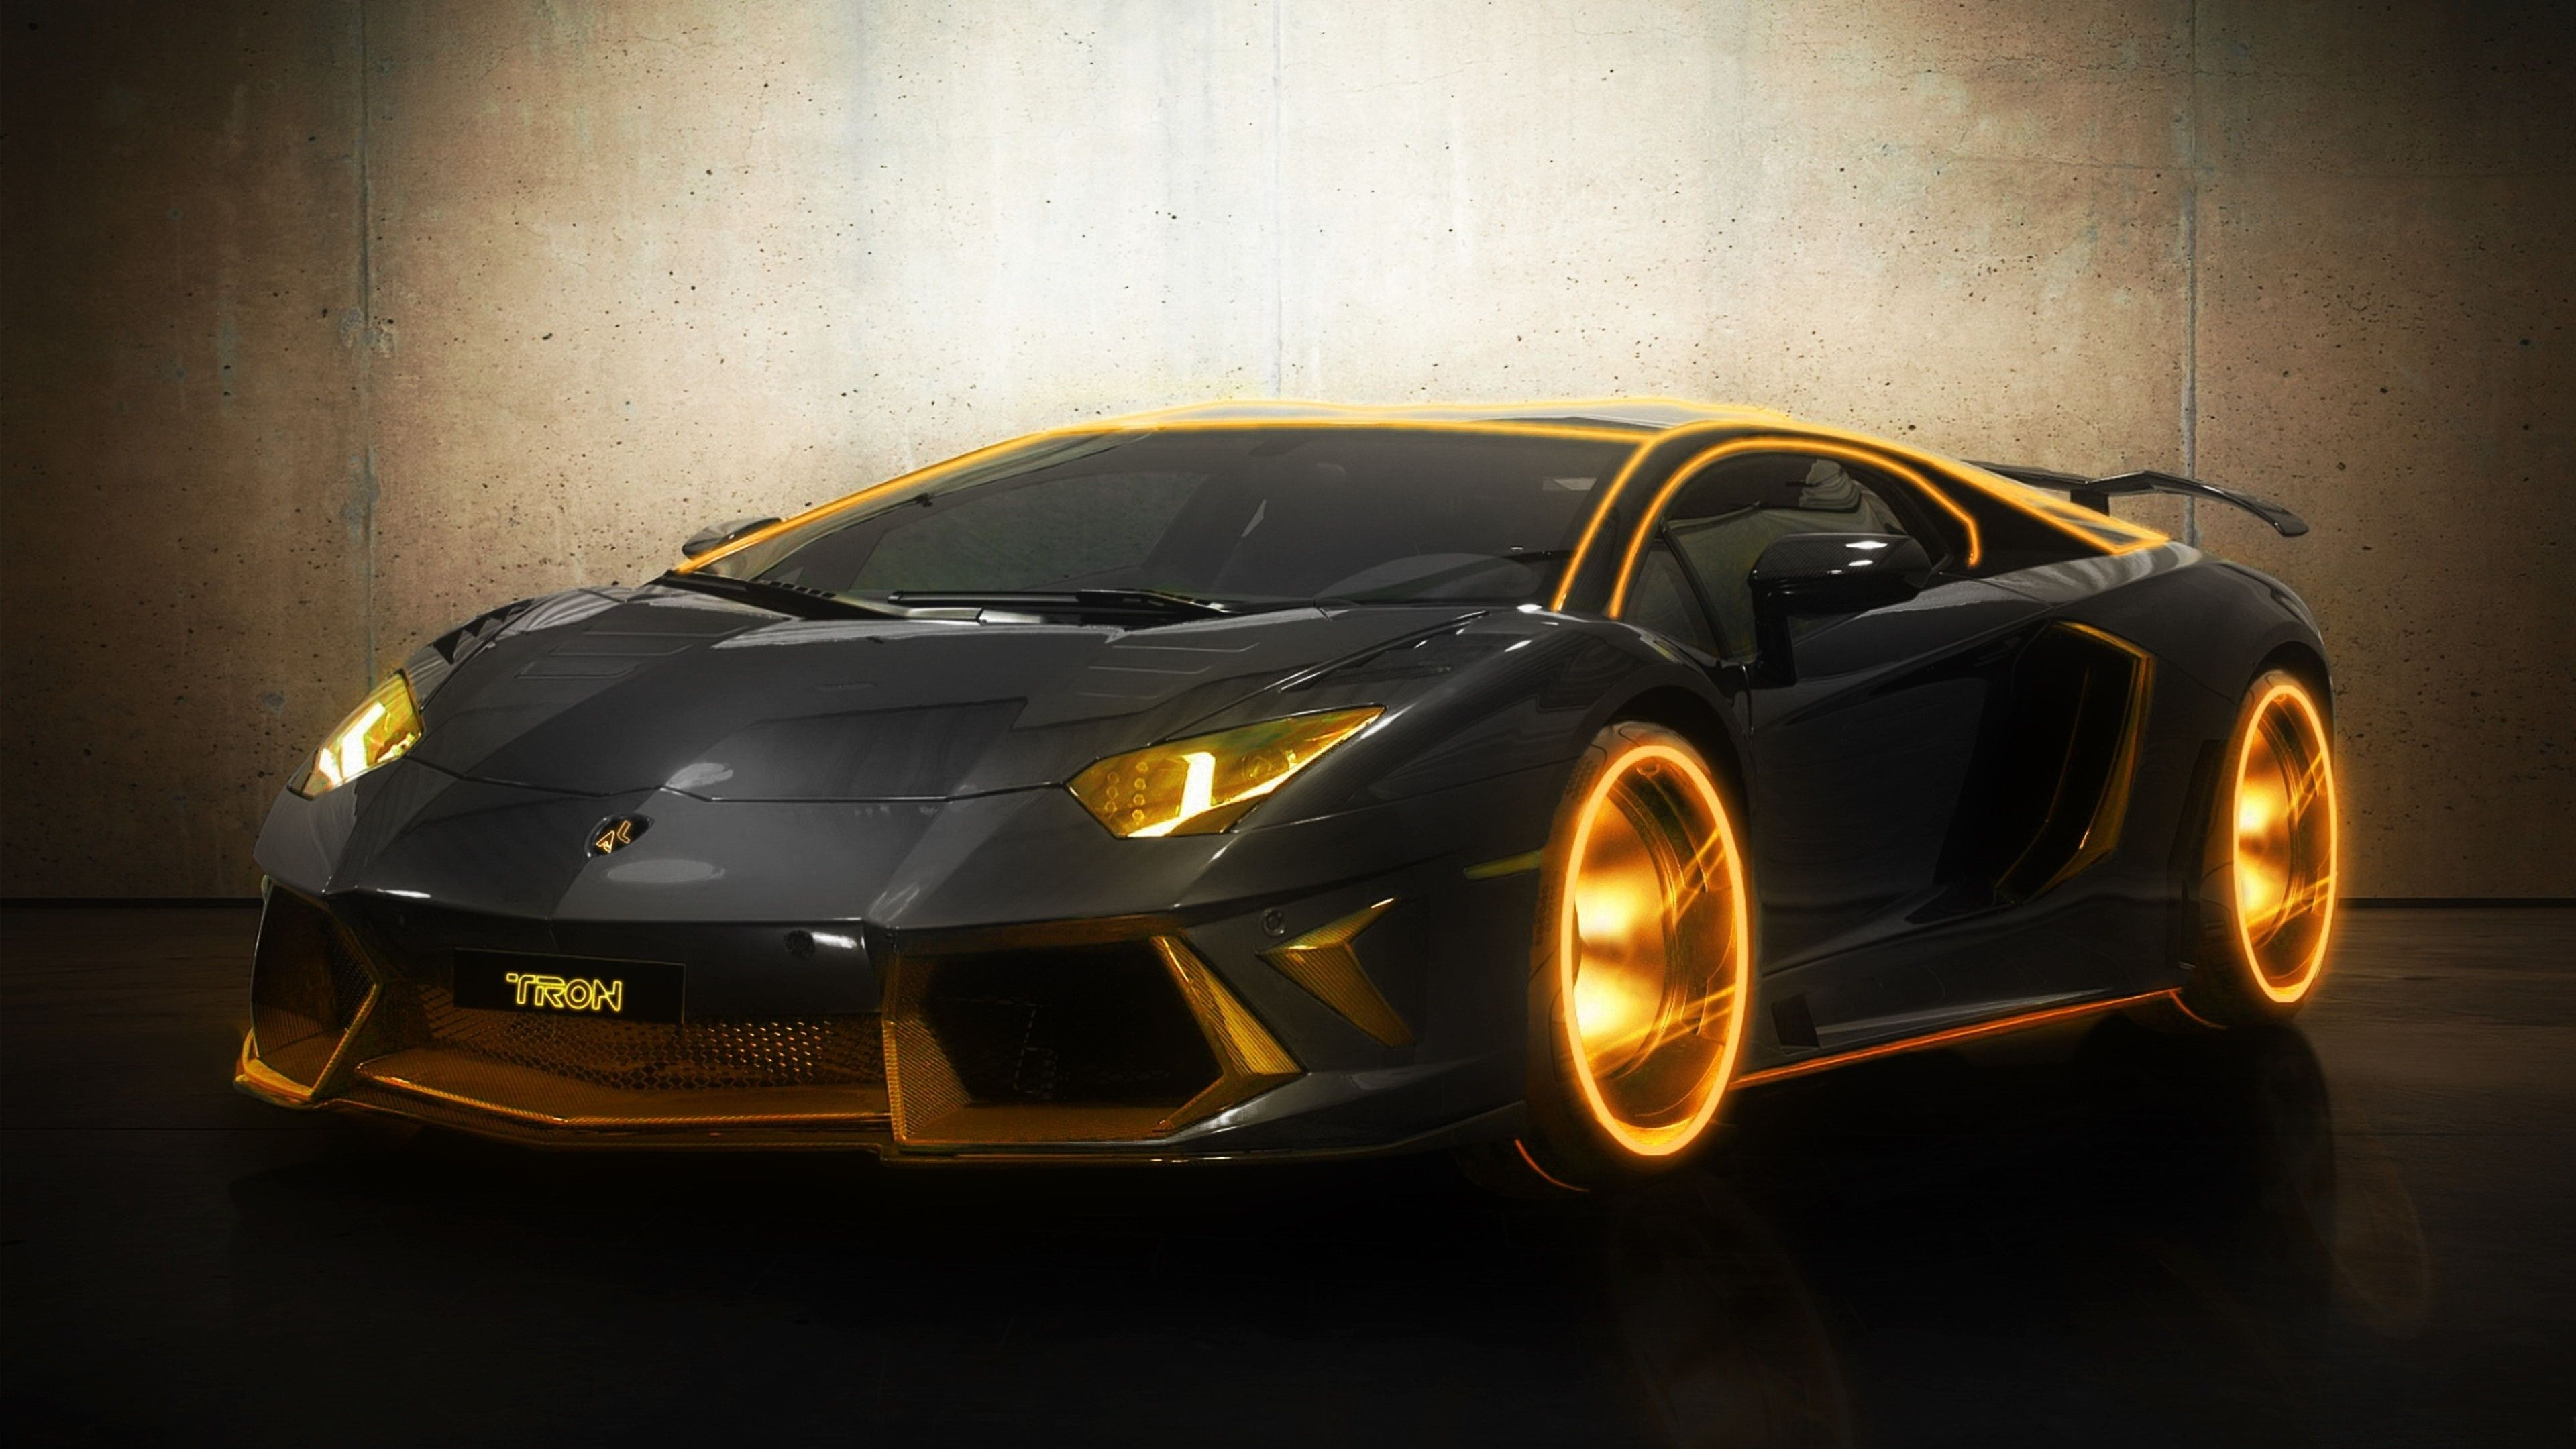 Cars Orange Tron Lambo Digitalized Supercars Lamborghini Aventador Colors Modified Lamborghini Aventador Wallpaper Gold Lamborghini Wallpaper Lamborghini Cars